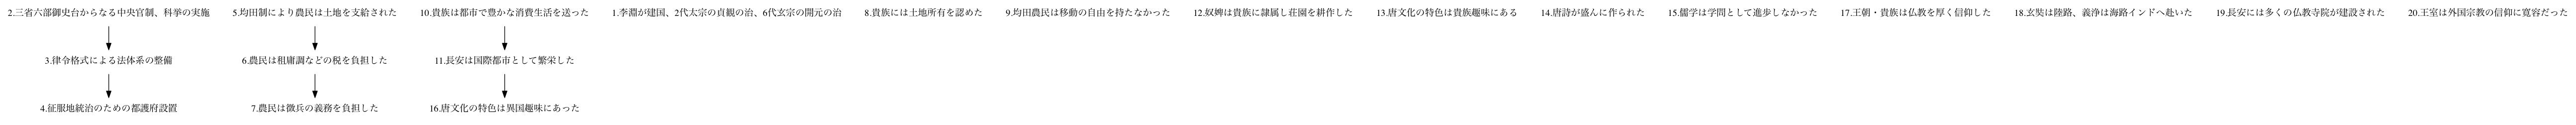 tou_x.png